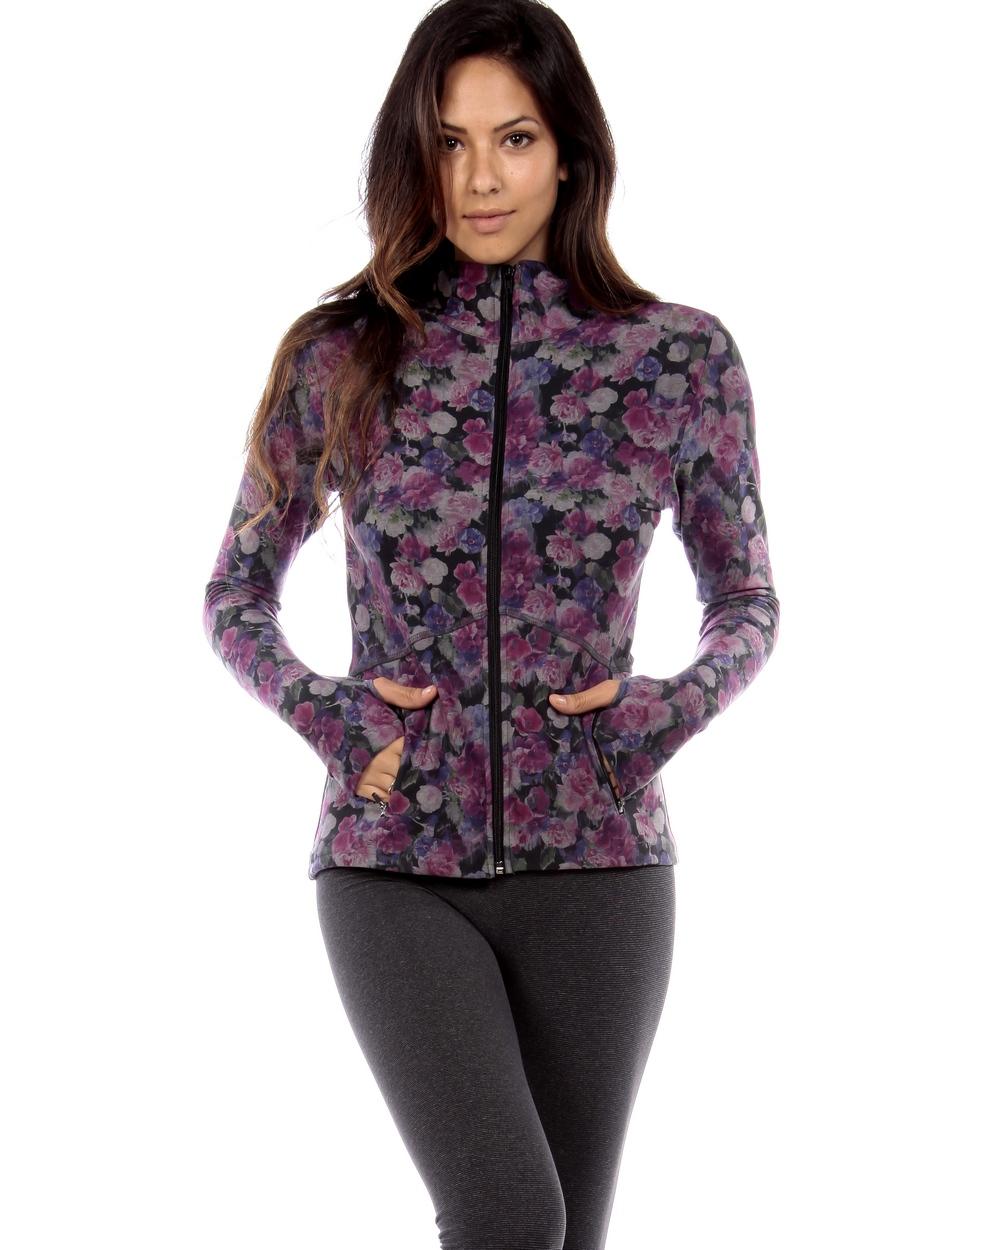 Strut This Lively Jacket Purple Floral